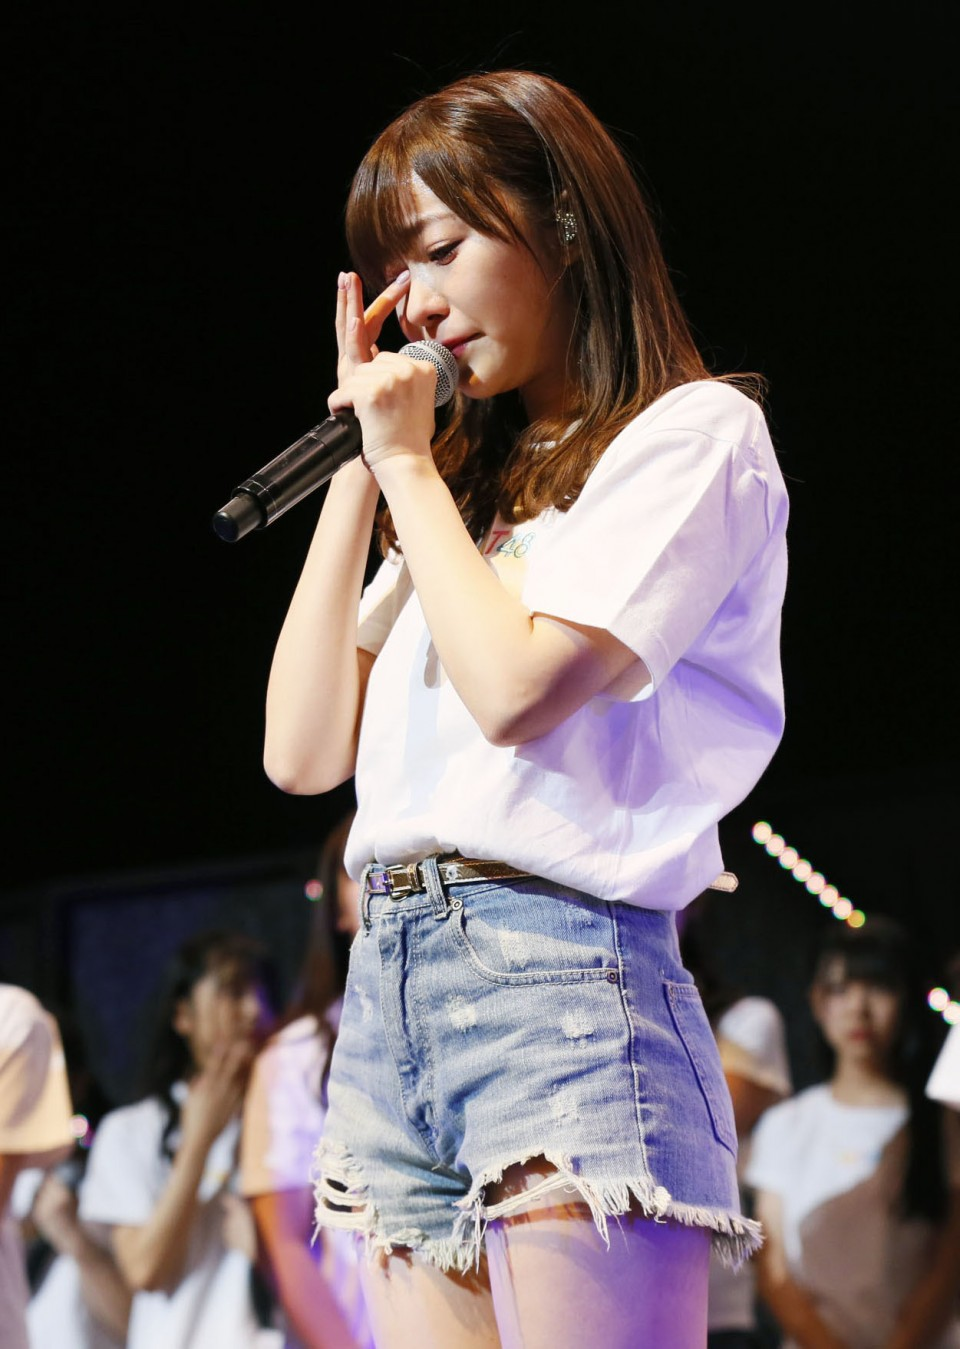 Japanese idol Rino Sashihara to leave group HKT48